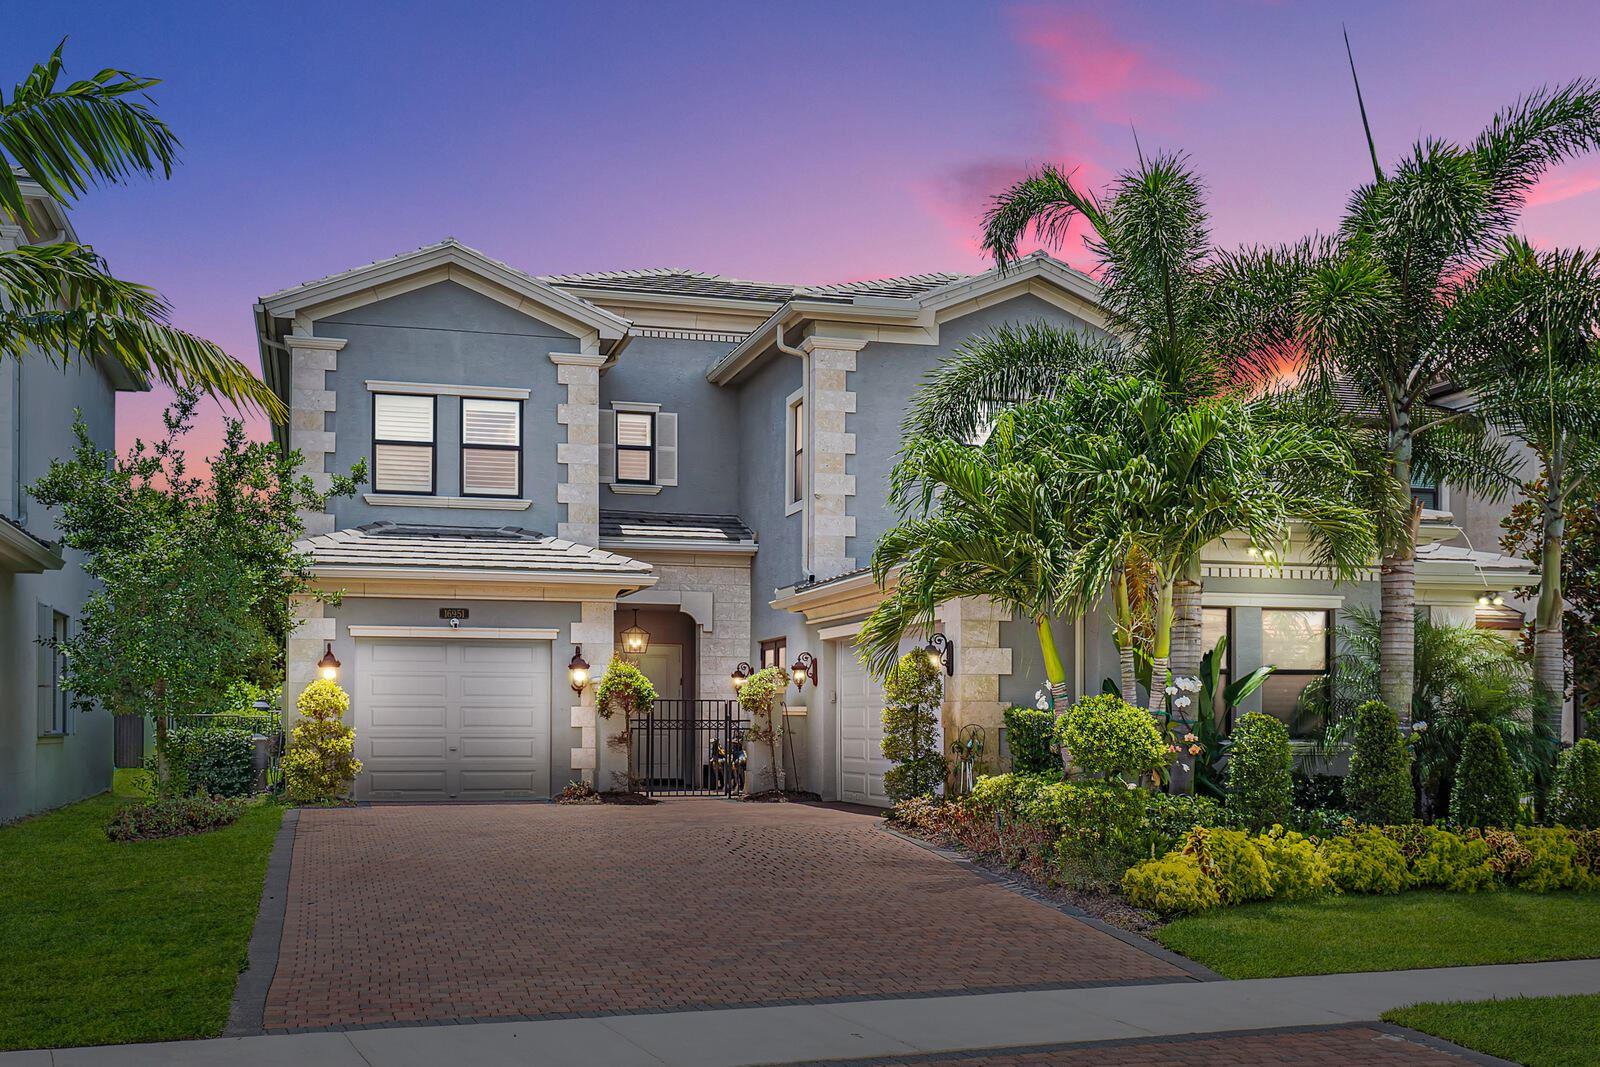 16951 Pavilion Way, Delray Beach, FL 33446 - MLS#: RX-10723821